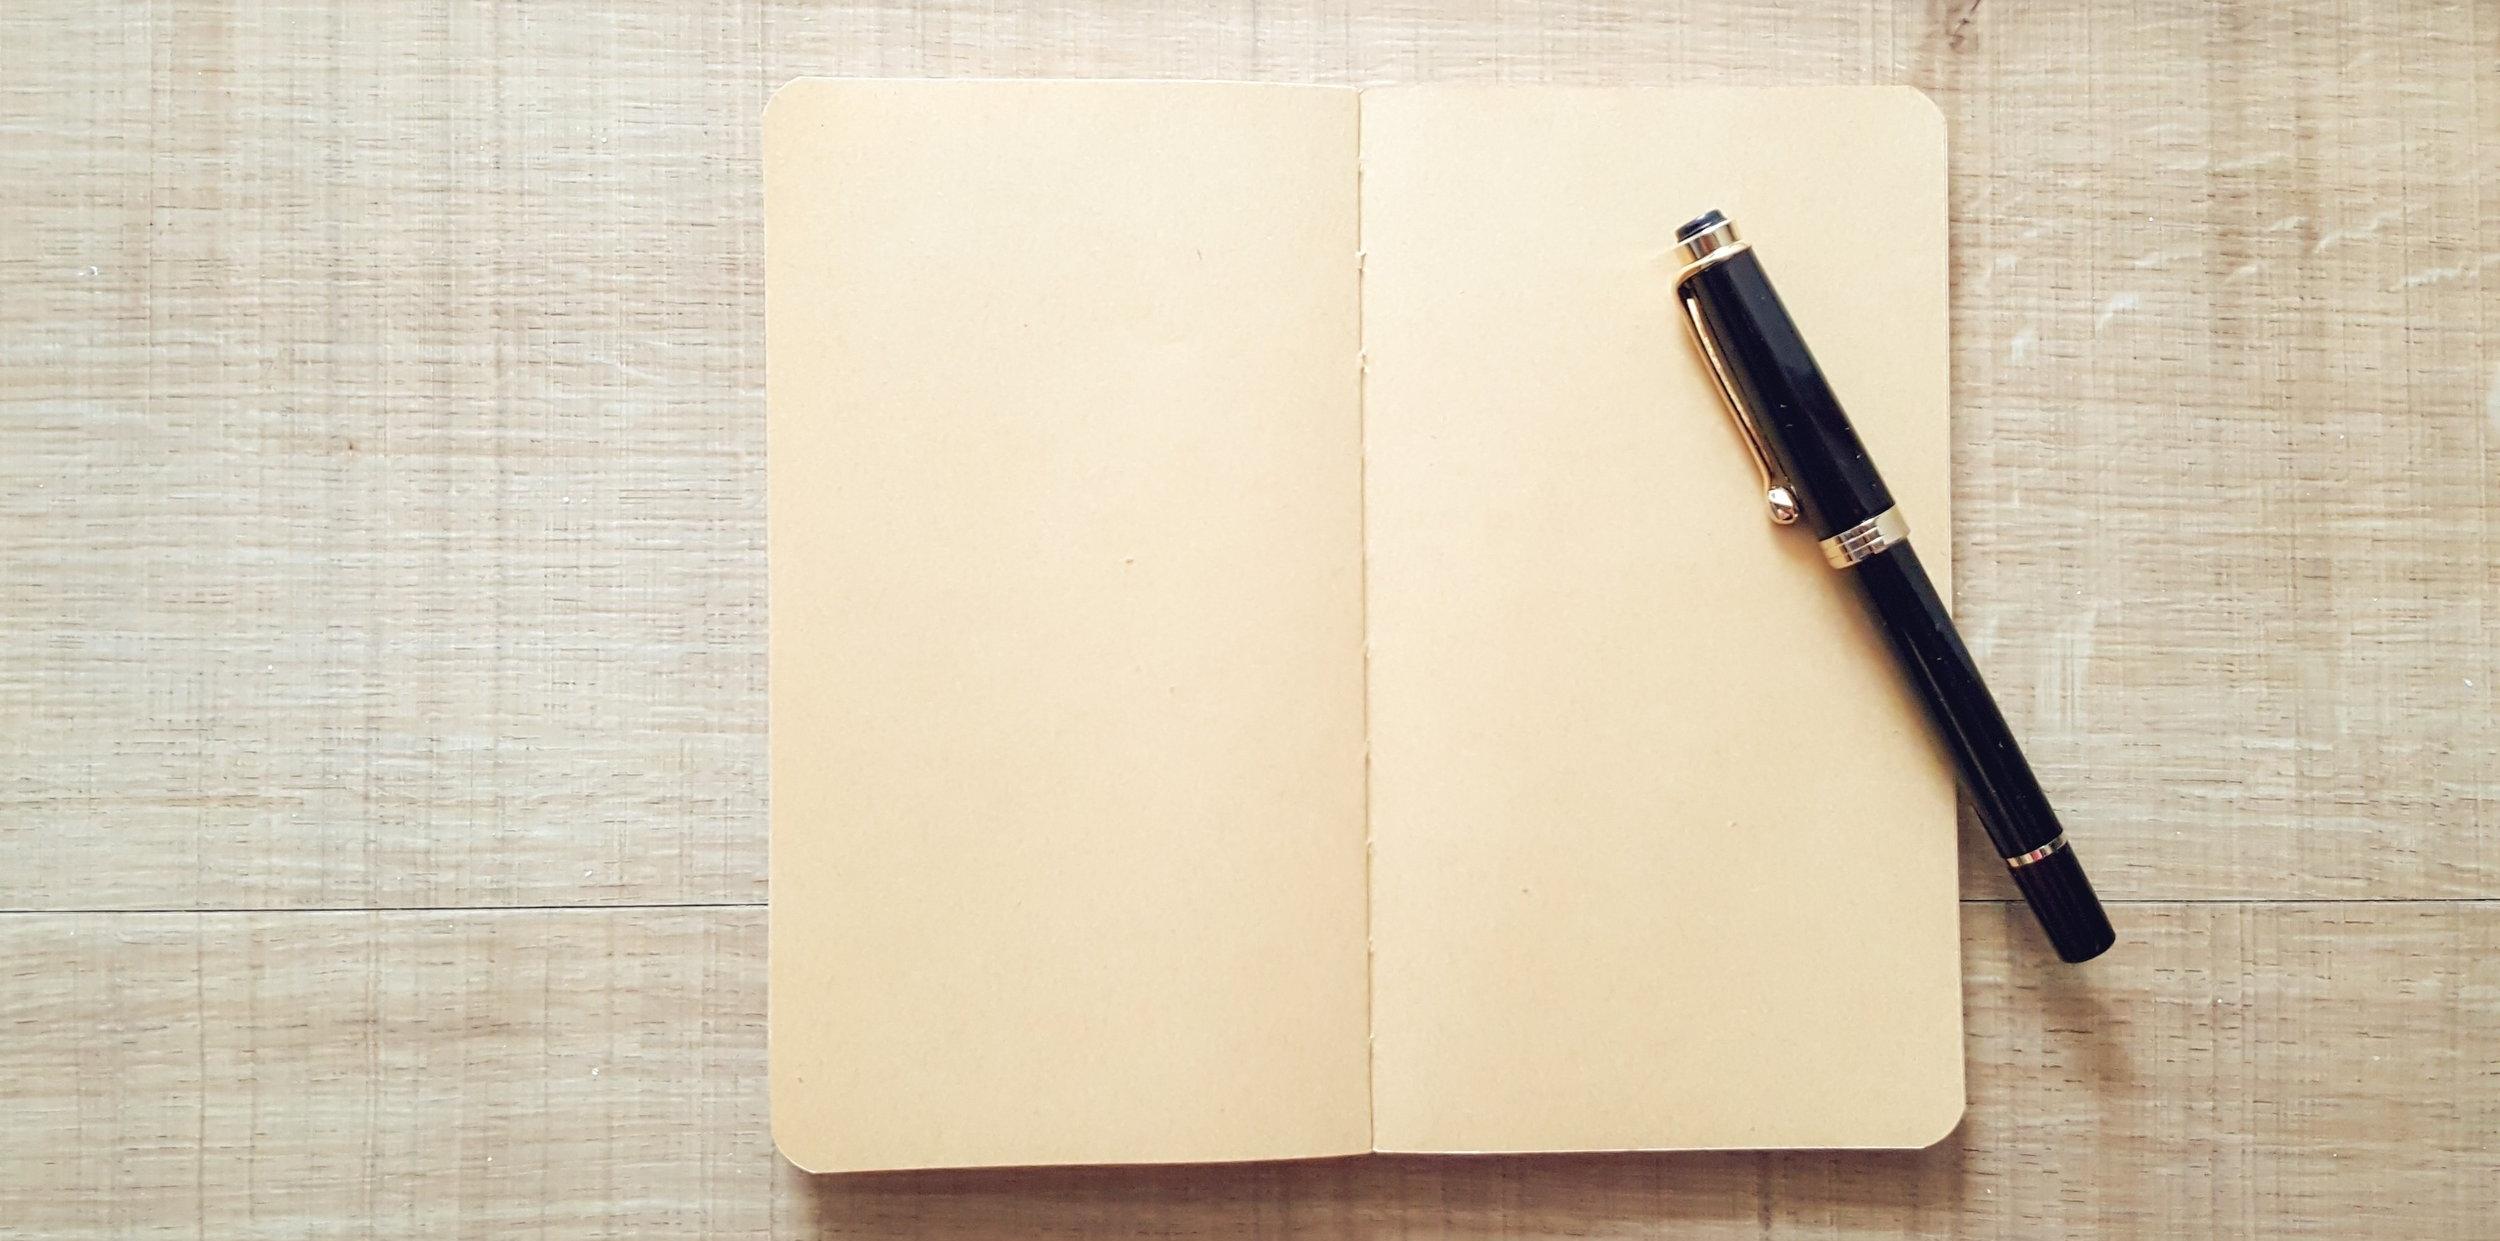 memo-notebook-paper-472311.jpg